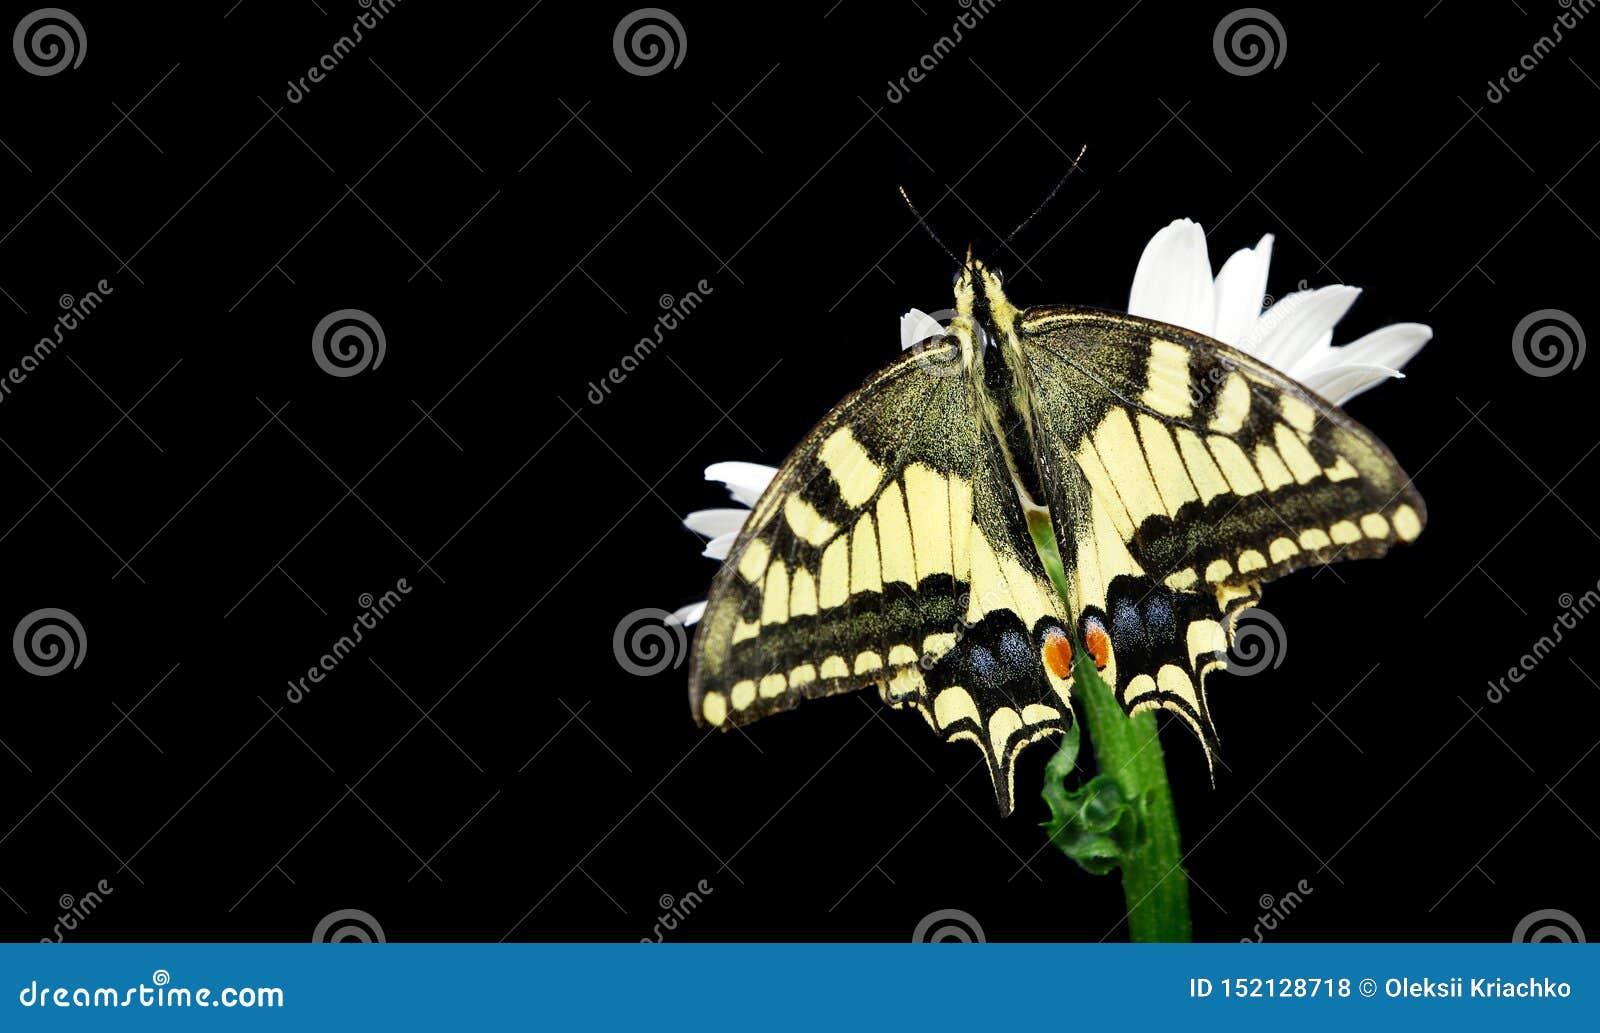 Beautiful butterfly sitting on a flower isolated on black. Colorful butterfly sitting on a daisy. Swallowtail butterfly, Papilio m